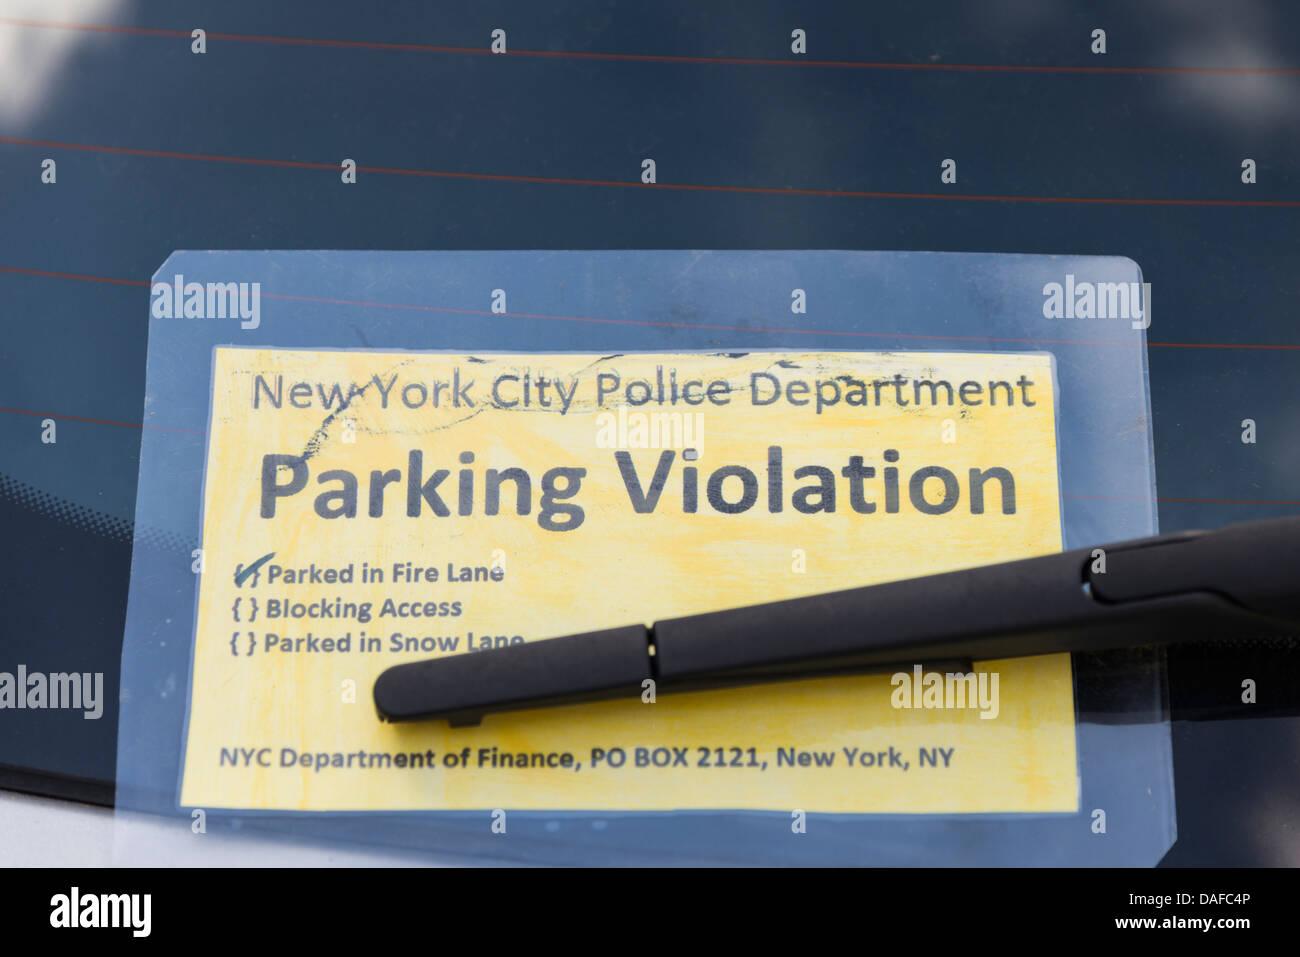 Imitation Parking Violation ticket stuck on car window Derbyshire England - Stock Image